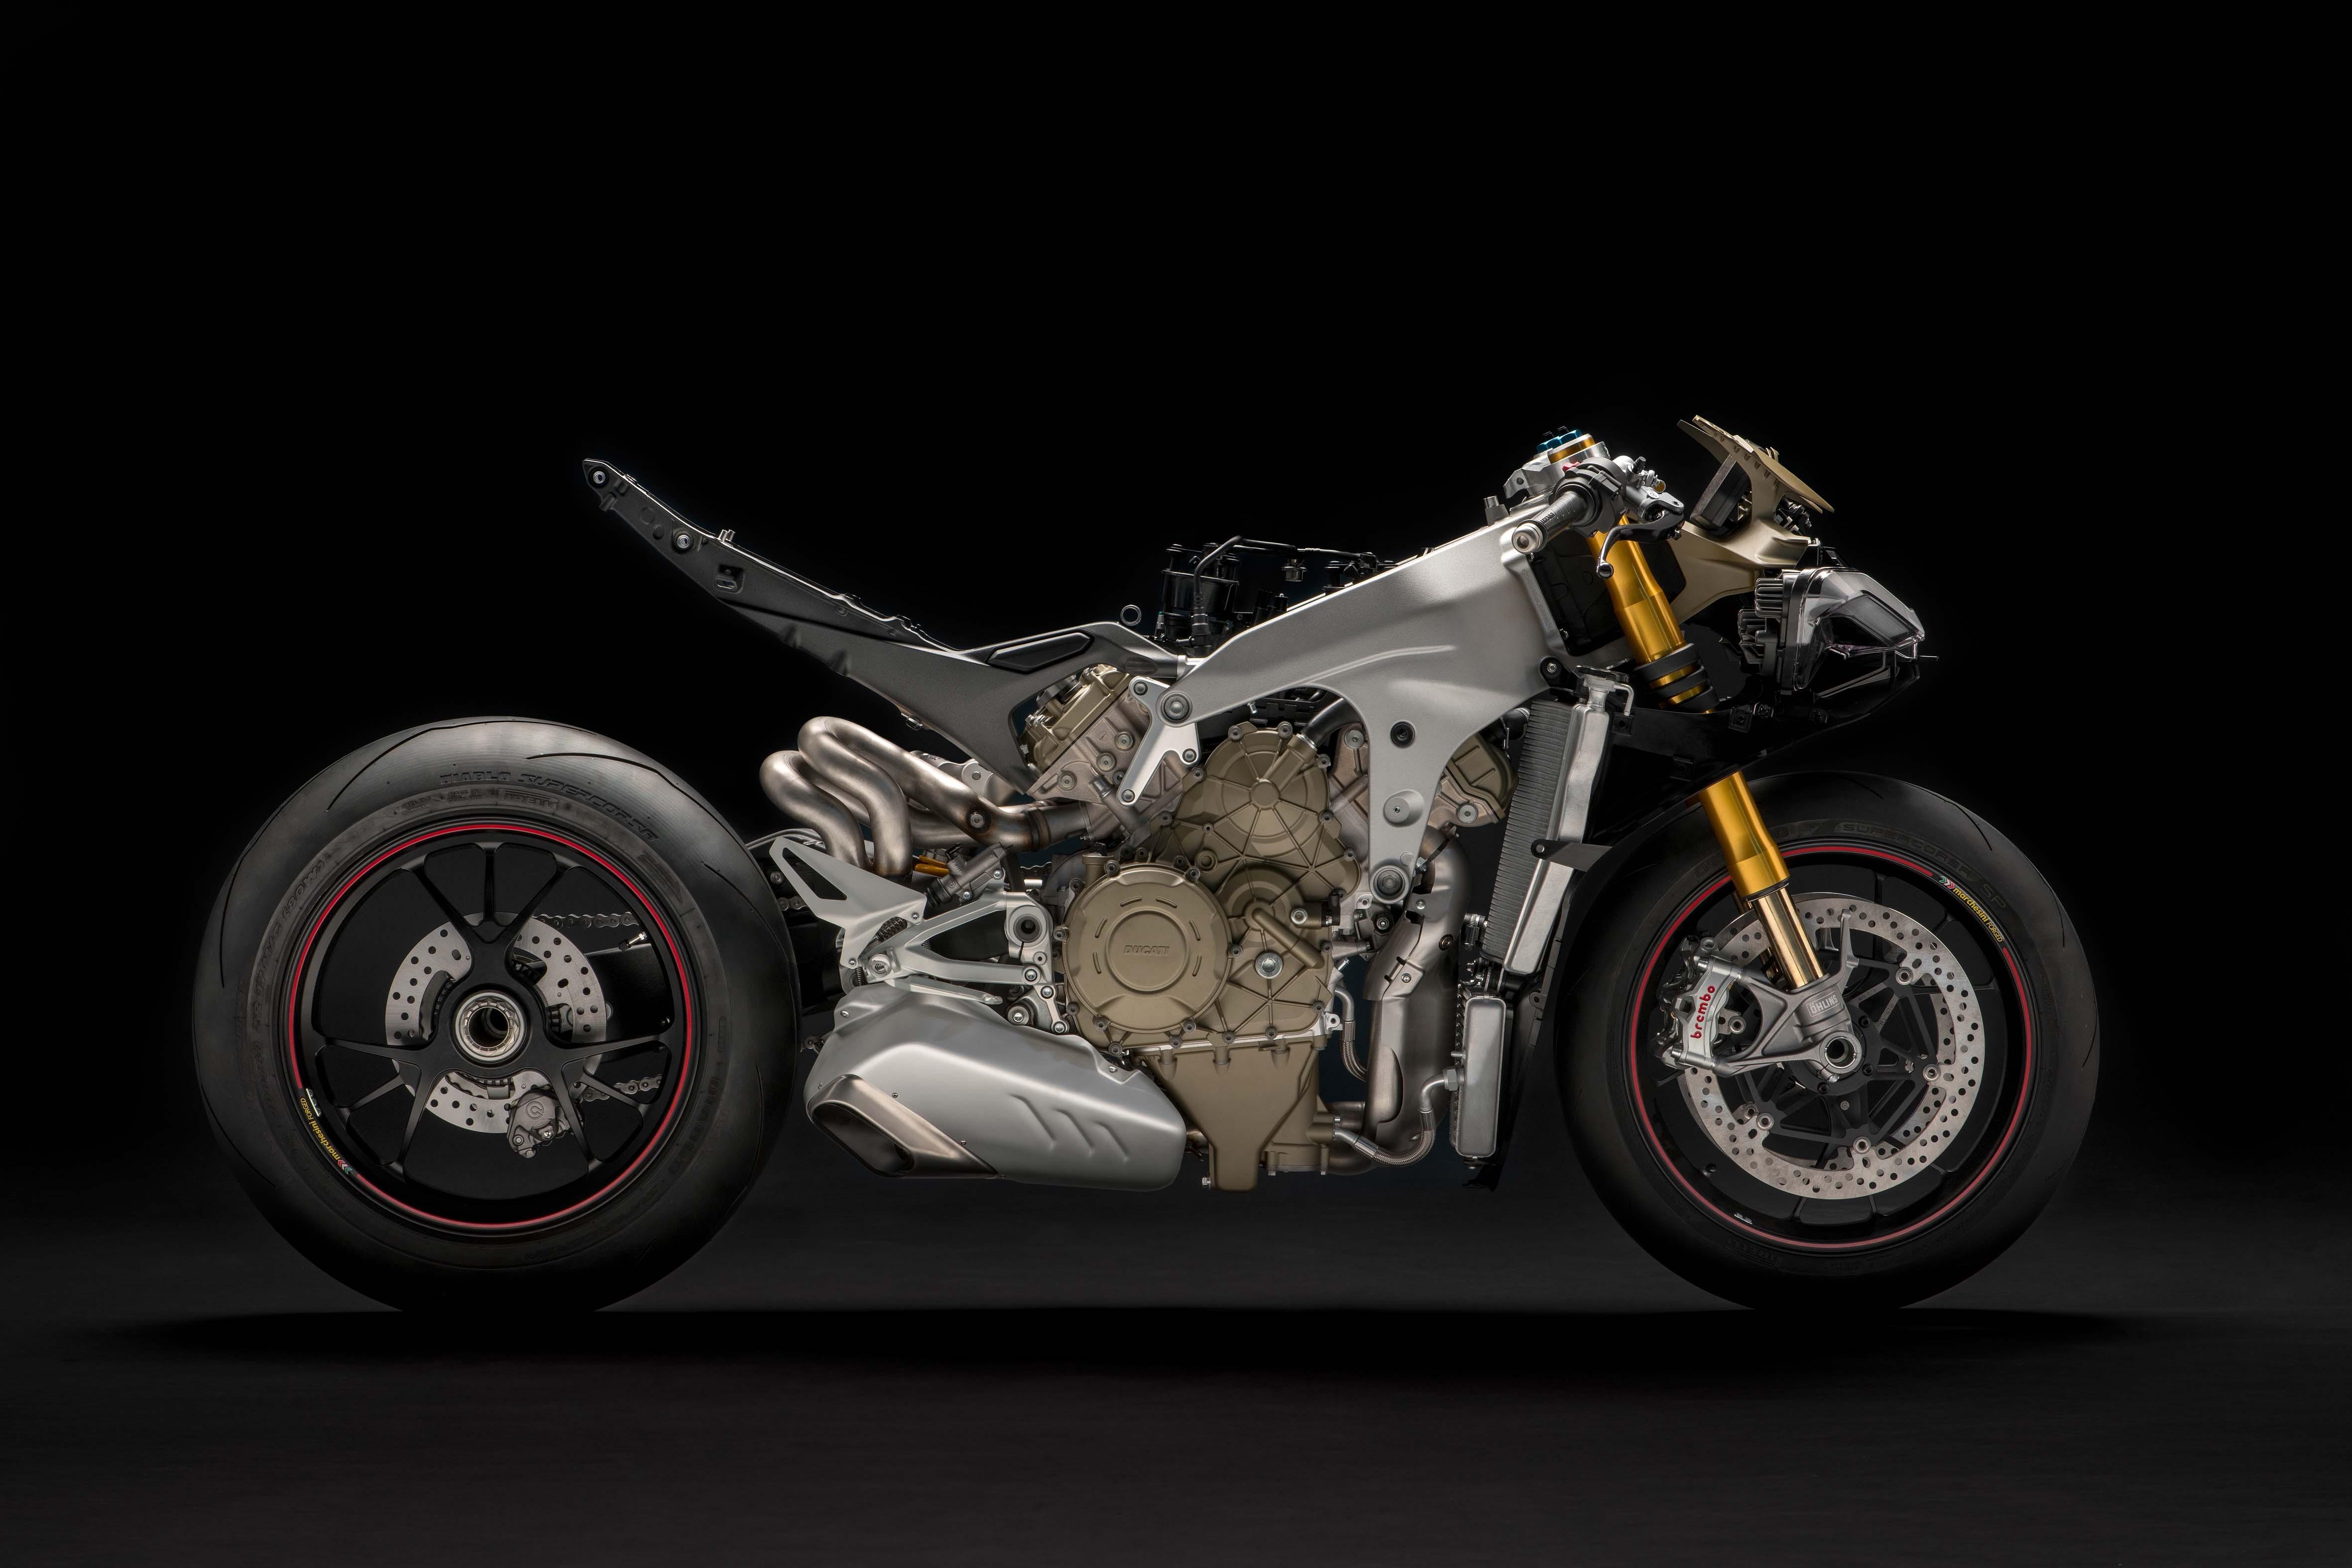 2018-Ducati-Panigale-V4-naked-no-fairings-01.jpg?fit=4724,3149&ssl=1